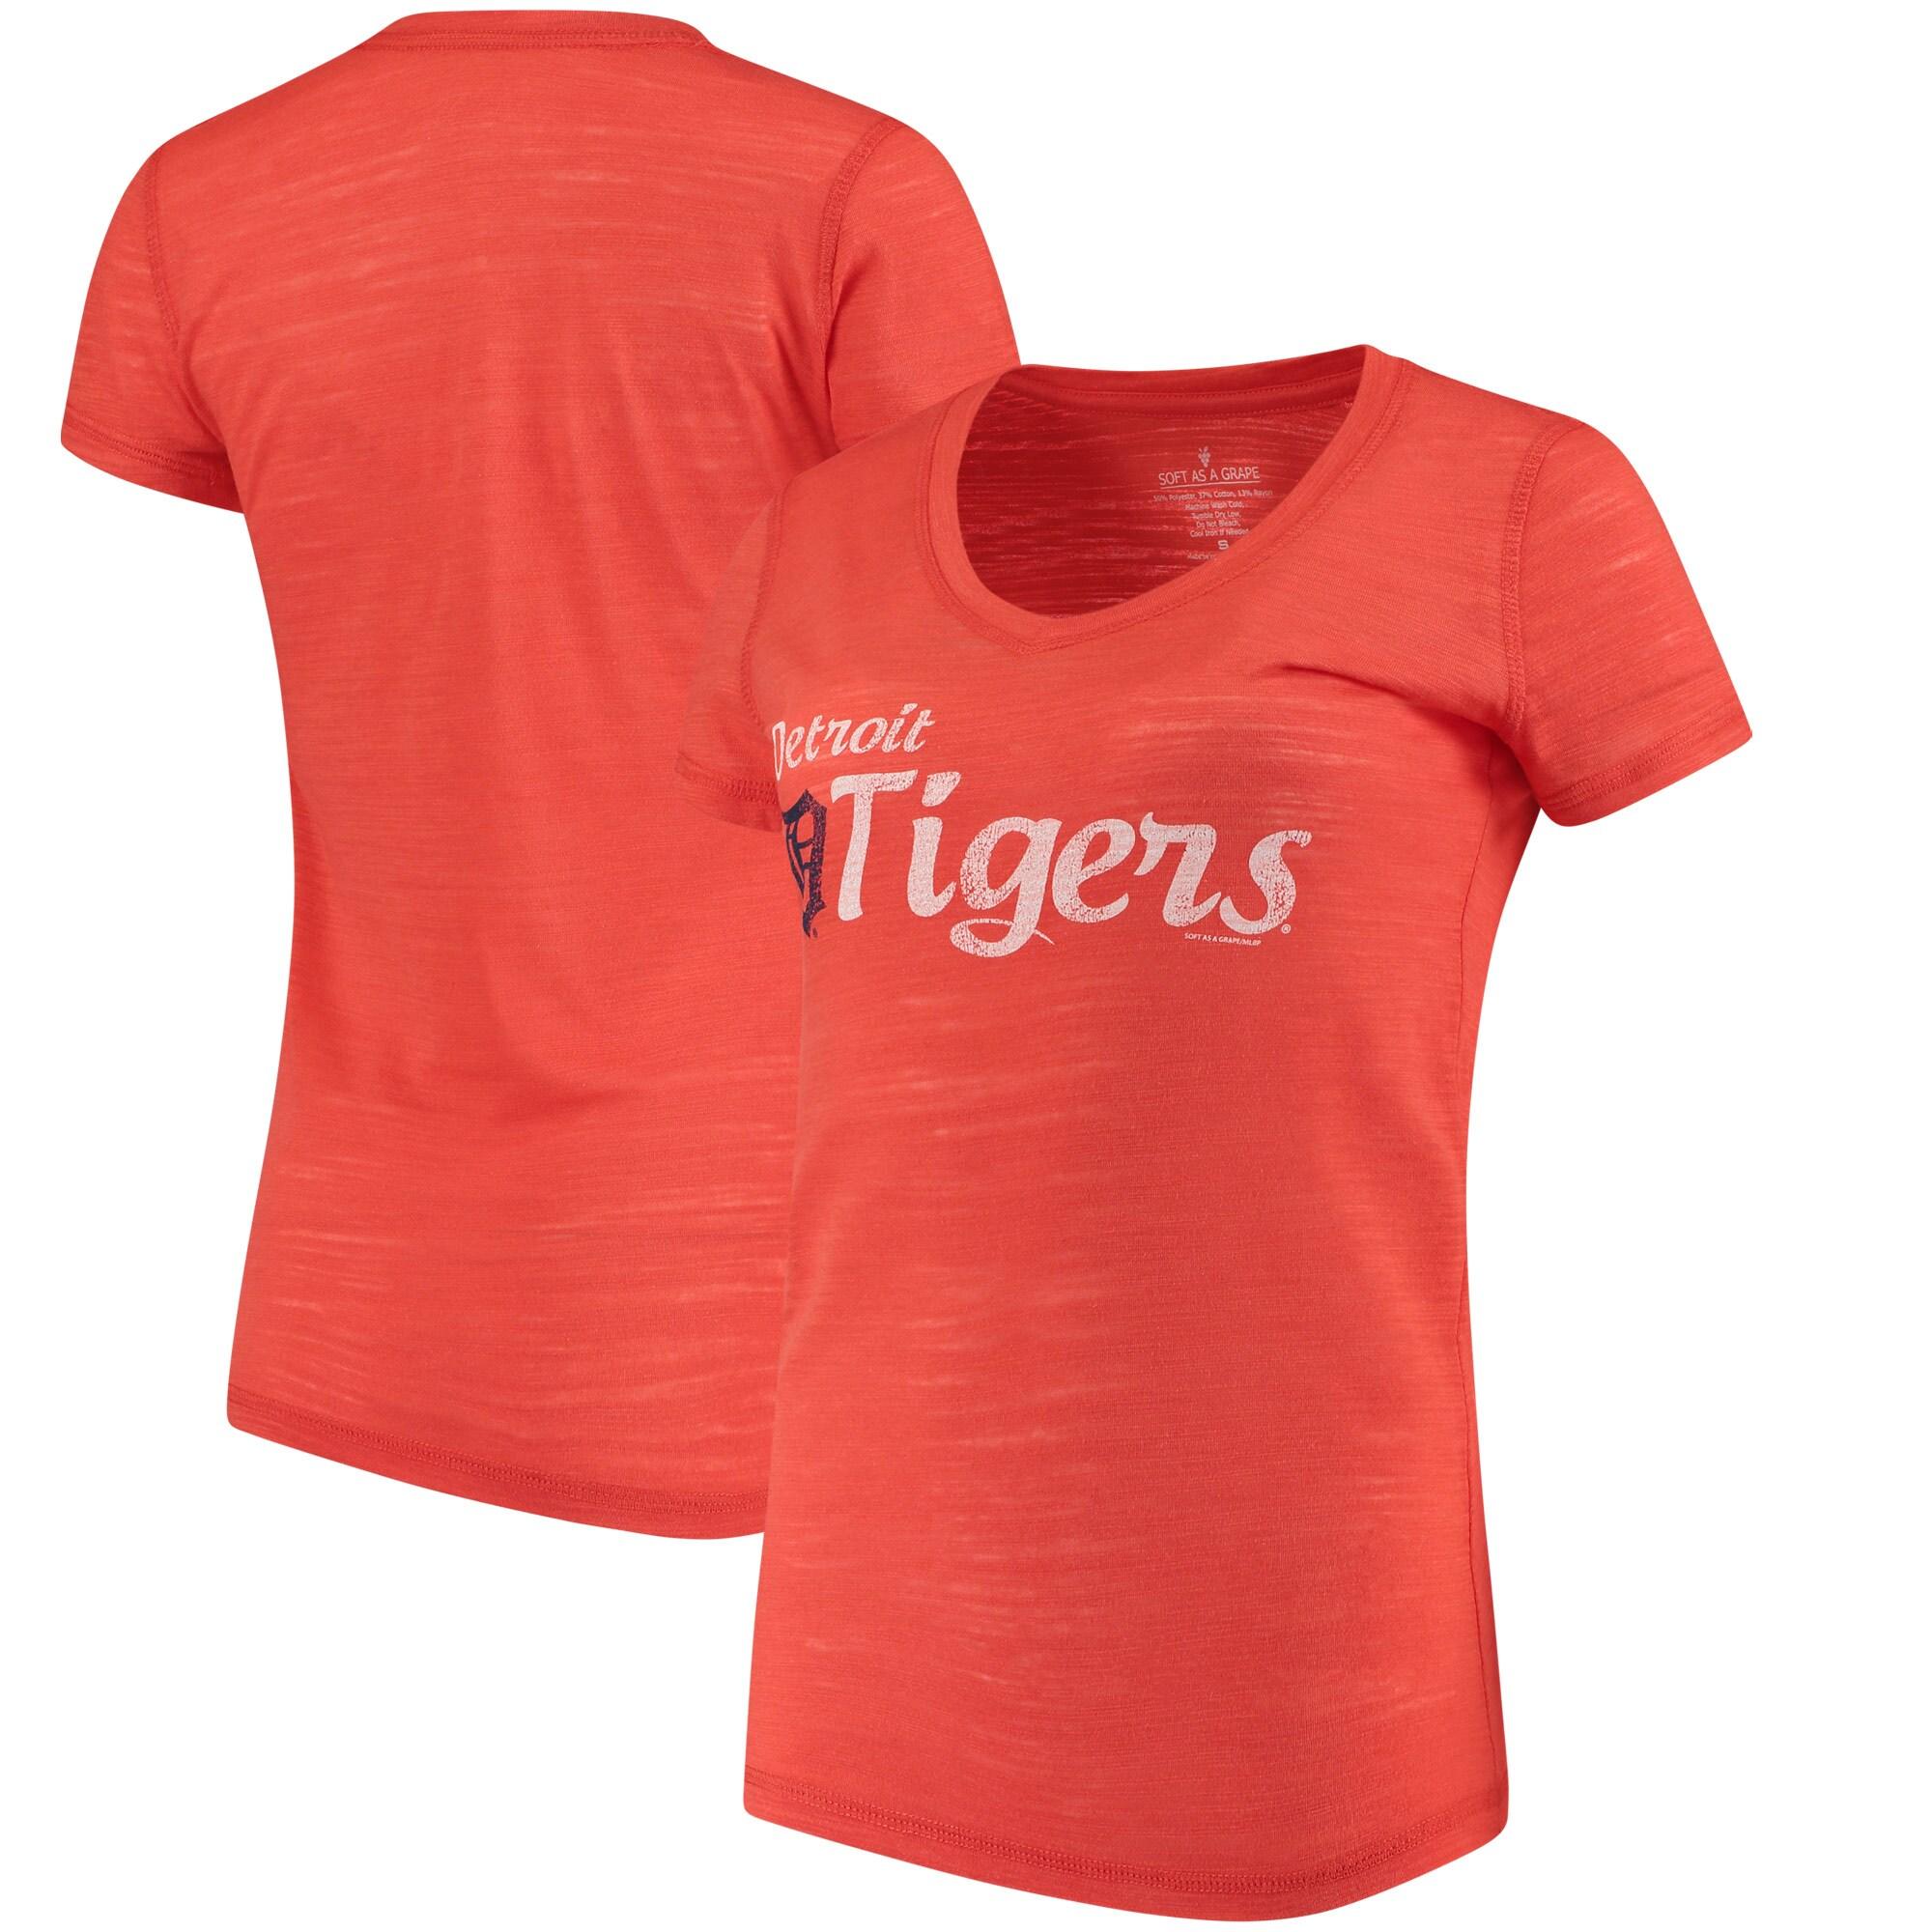 Detroit Tigers Soft As A Grape Women's Double Steal Tri-Blend V-Neck T-Shirt - Orange